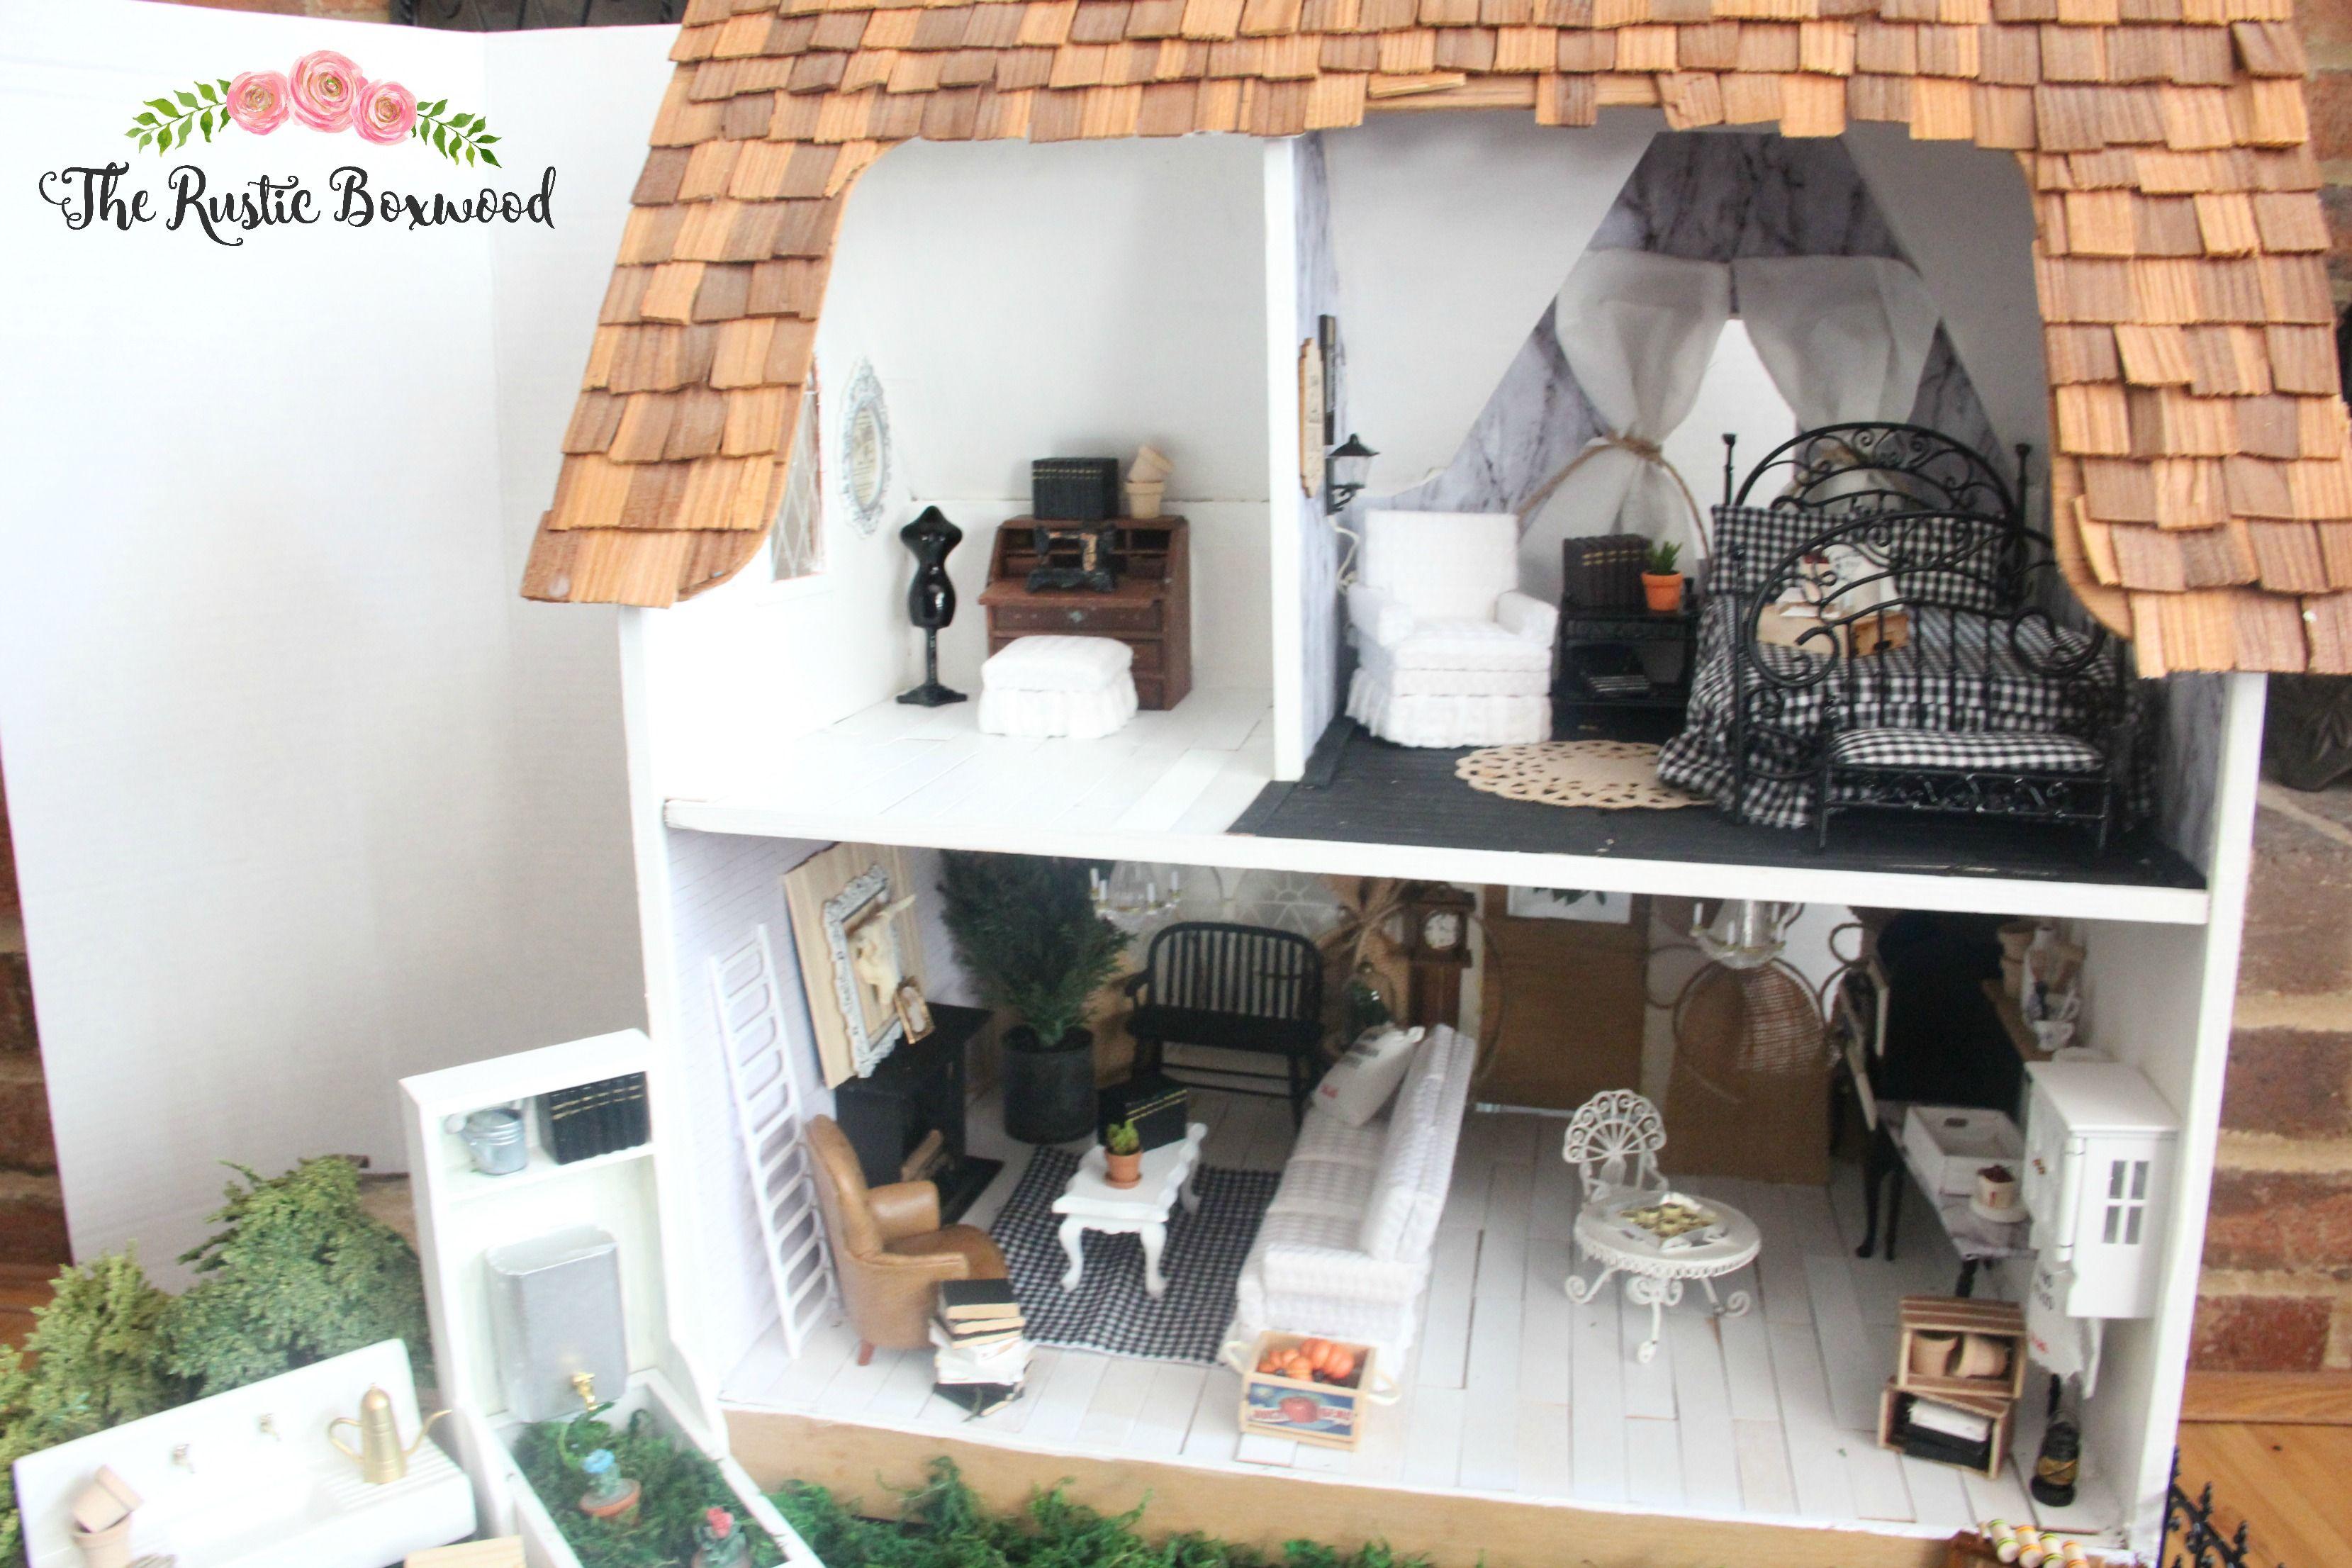 Diy Farmhouse Styled Dollhouse Makeover The Rustic Boxwood Diy Modern Minis Miniatures Dollhouse Min Diy Farmhouse Decor Doll House Farmhouse Style Diy